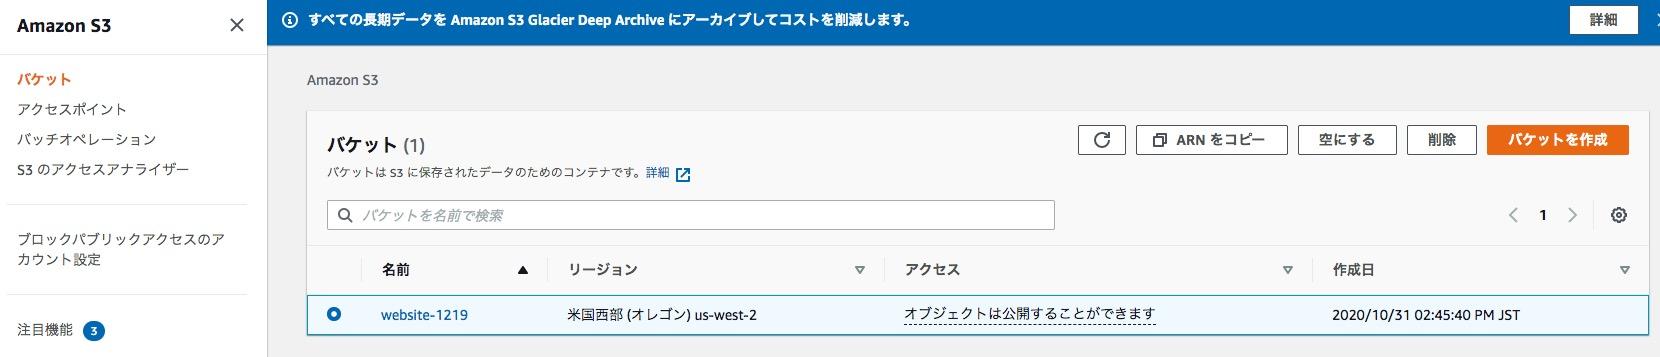 手順7:AWS Storage GatewayのNFSを動作確認